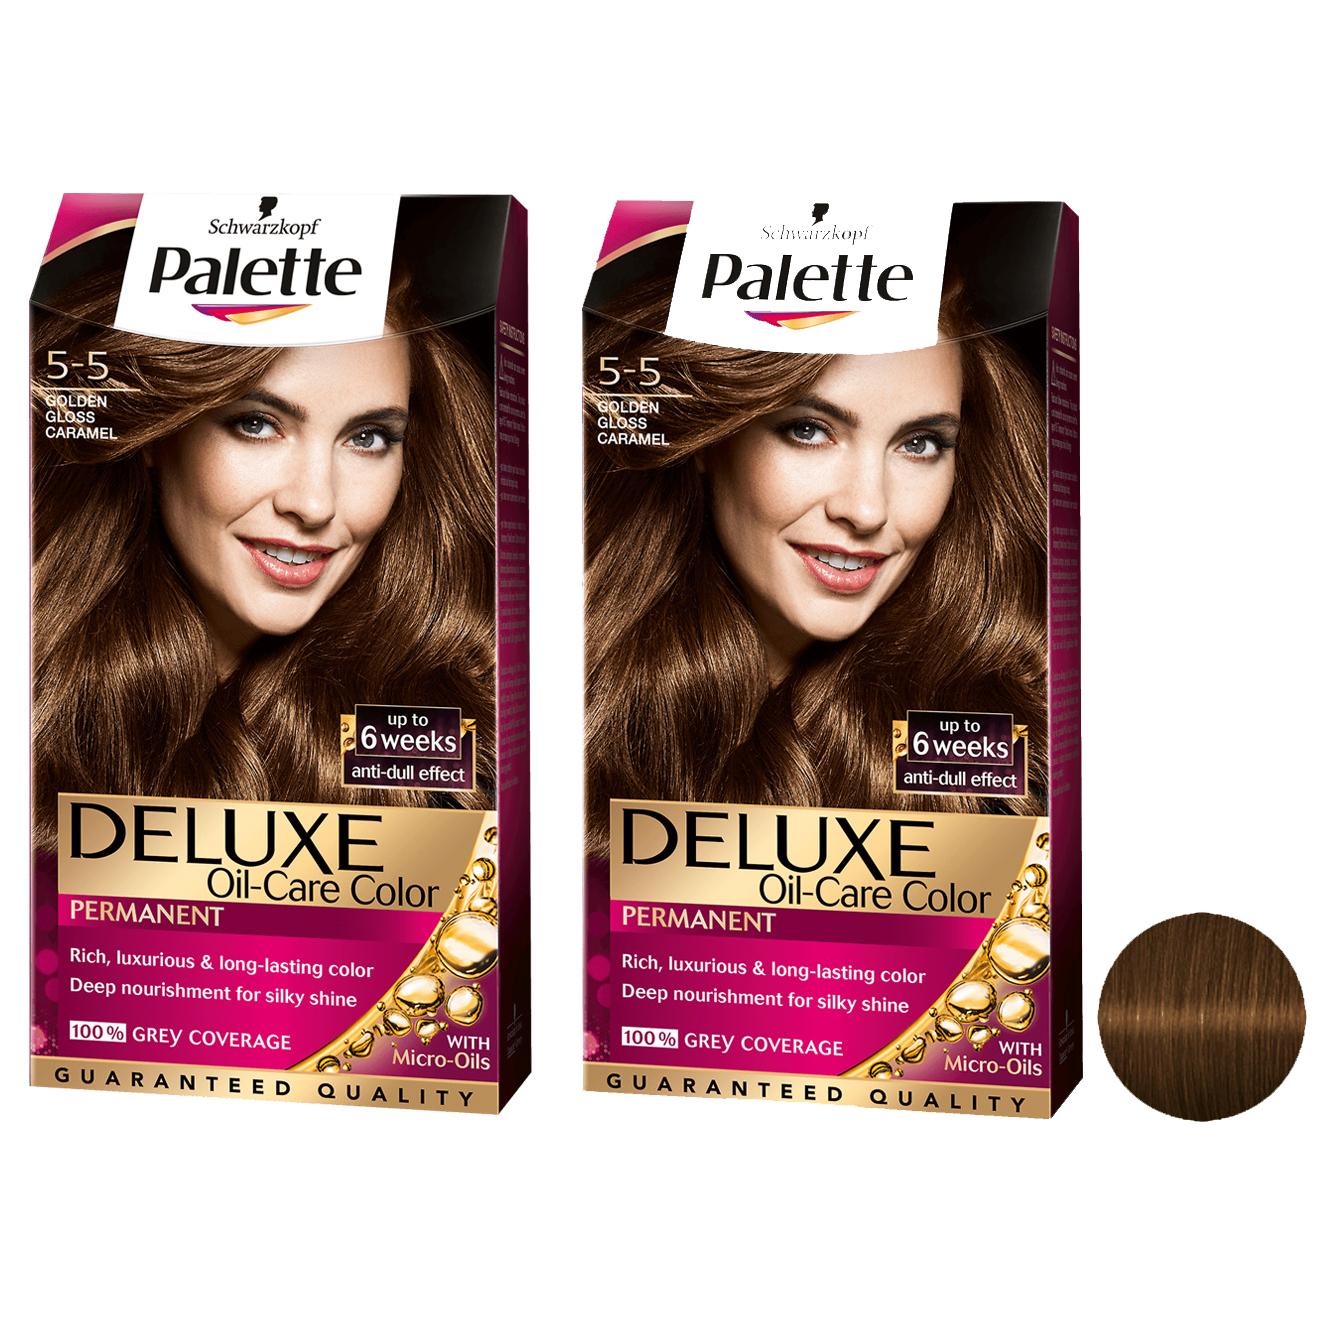 کیت رنگ مو پلت سری DELUXE شماره 5-5 حجم 50 میلی لیتر رنگ بلوند کاراملی مجموعه 2 عددی